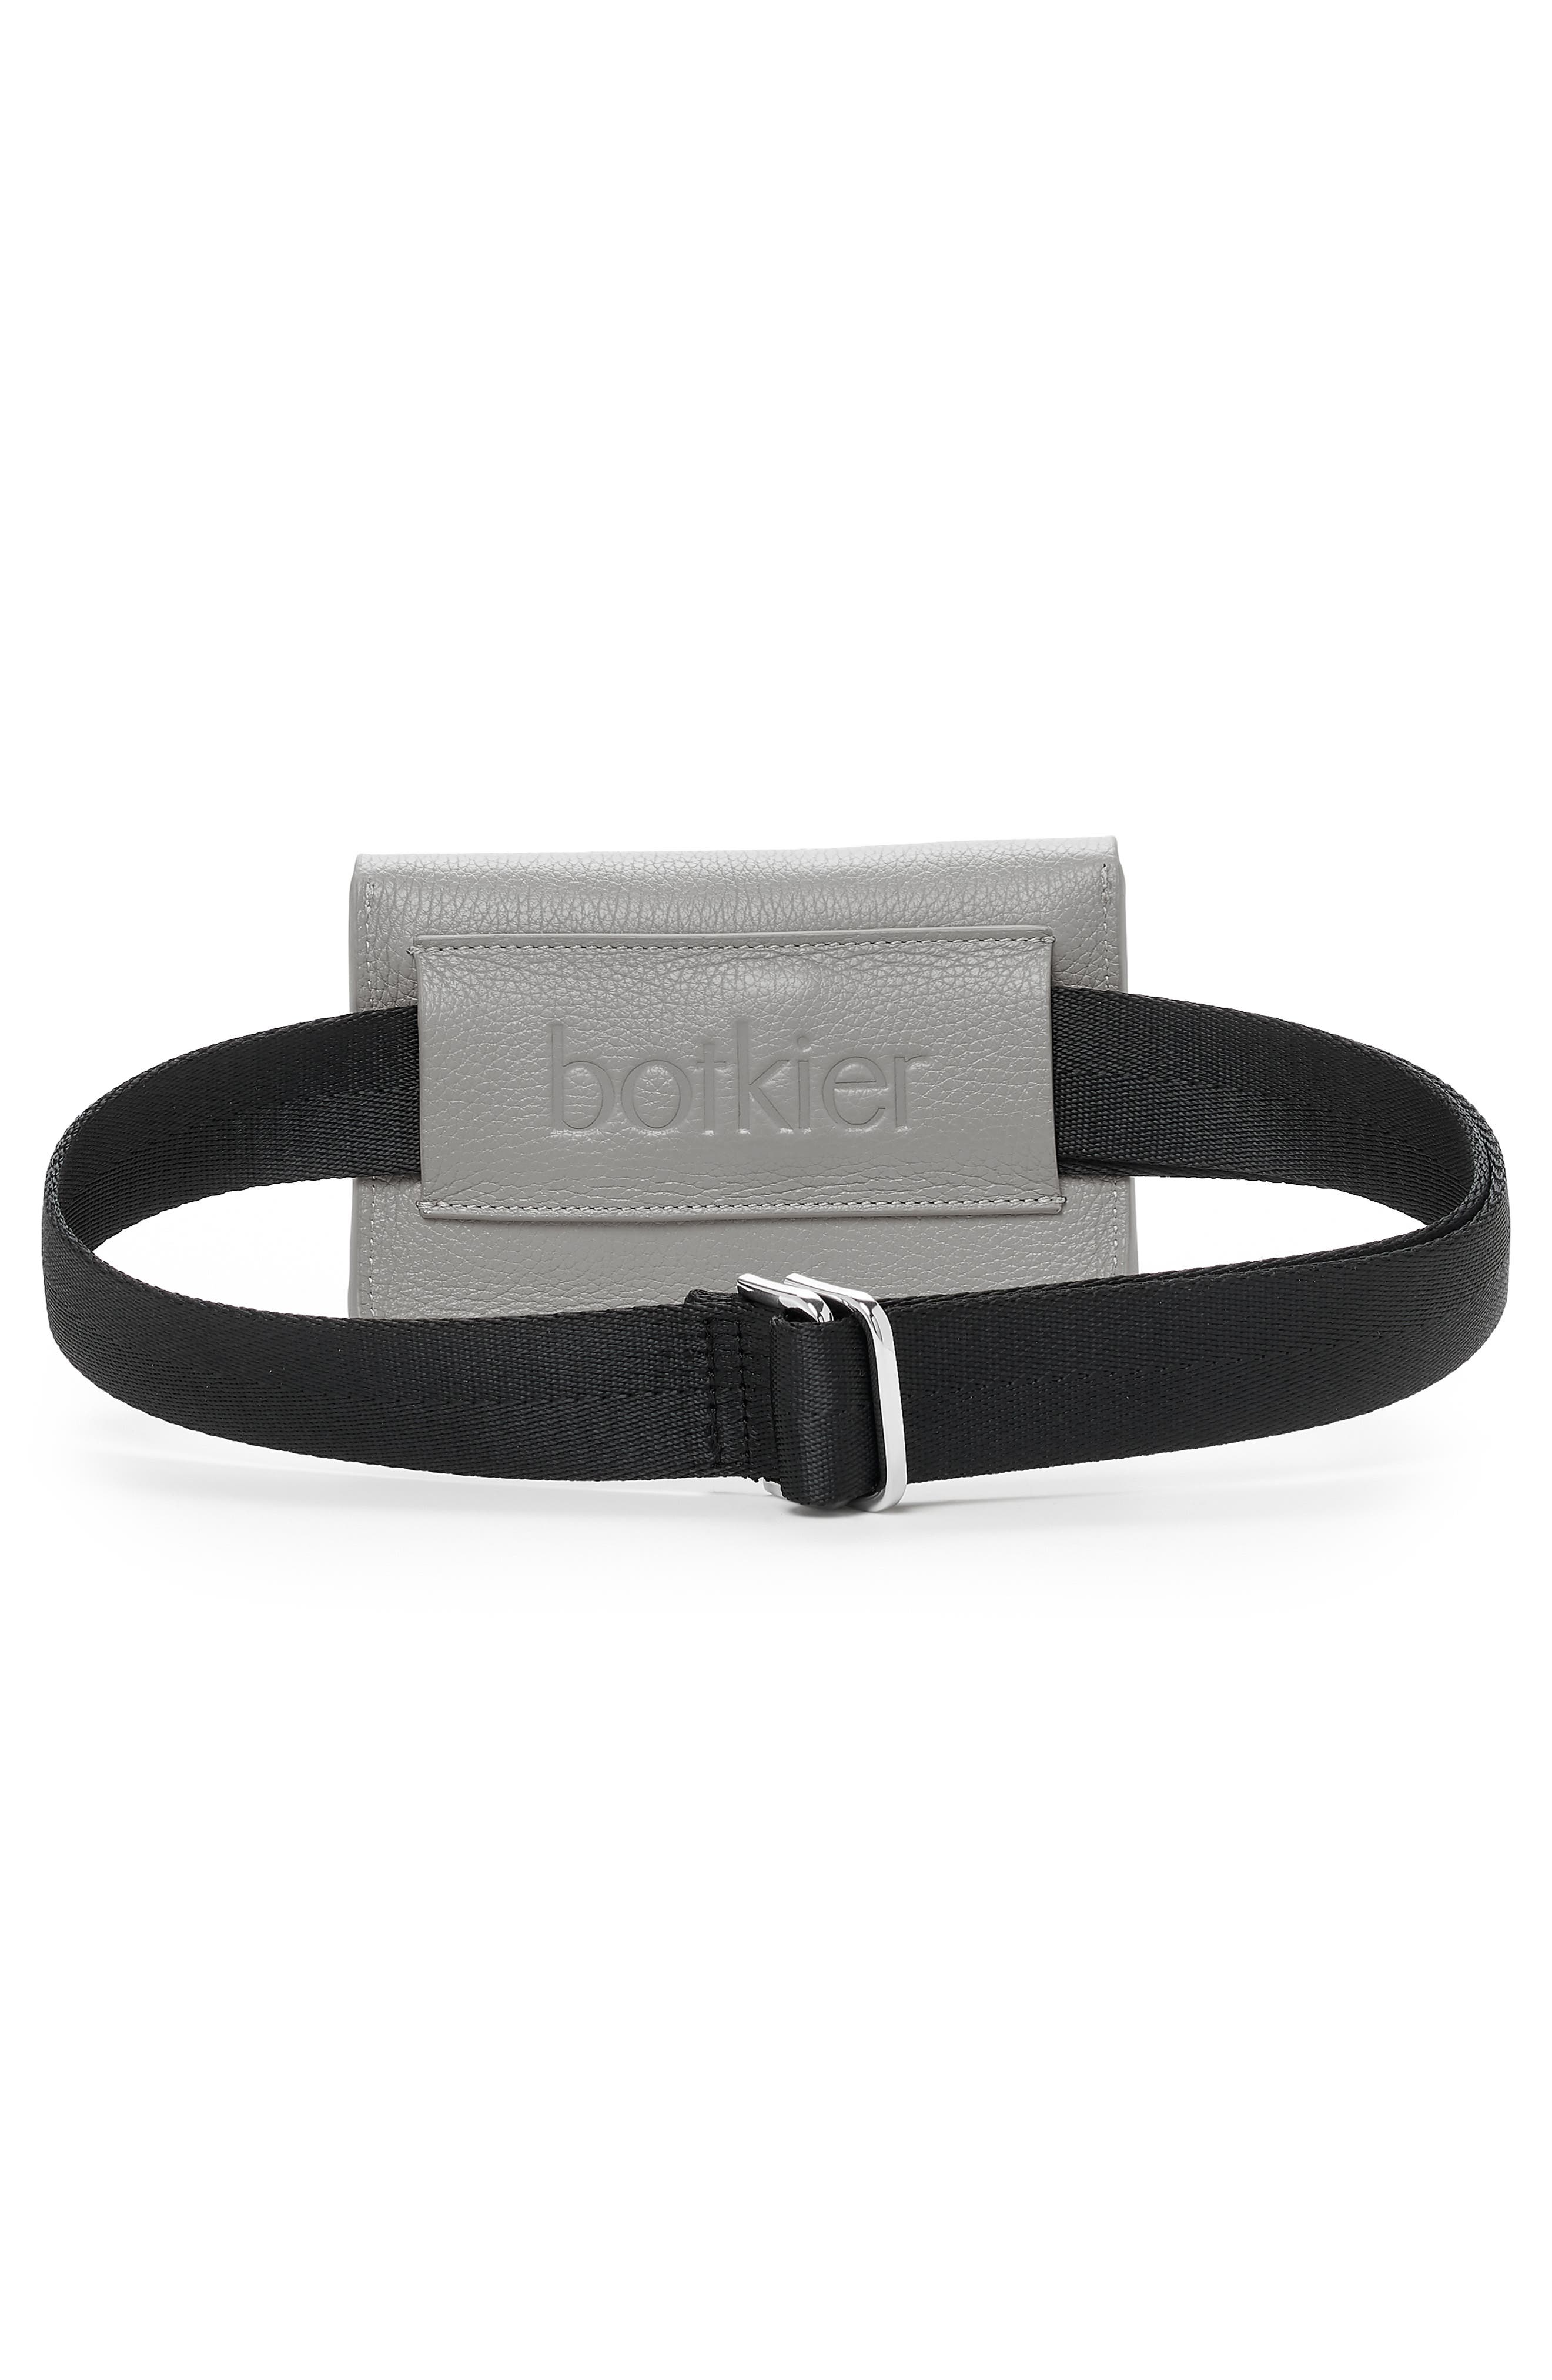 BOTKIER,                             Vivi Calfskin Leather Belt Bag,                             Alternate thumbnail 2, color,                             SILVER GREY